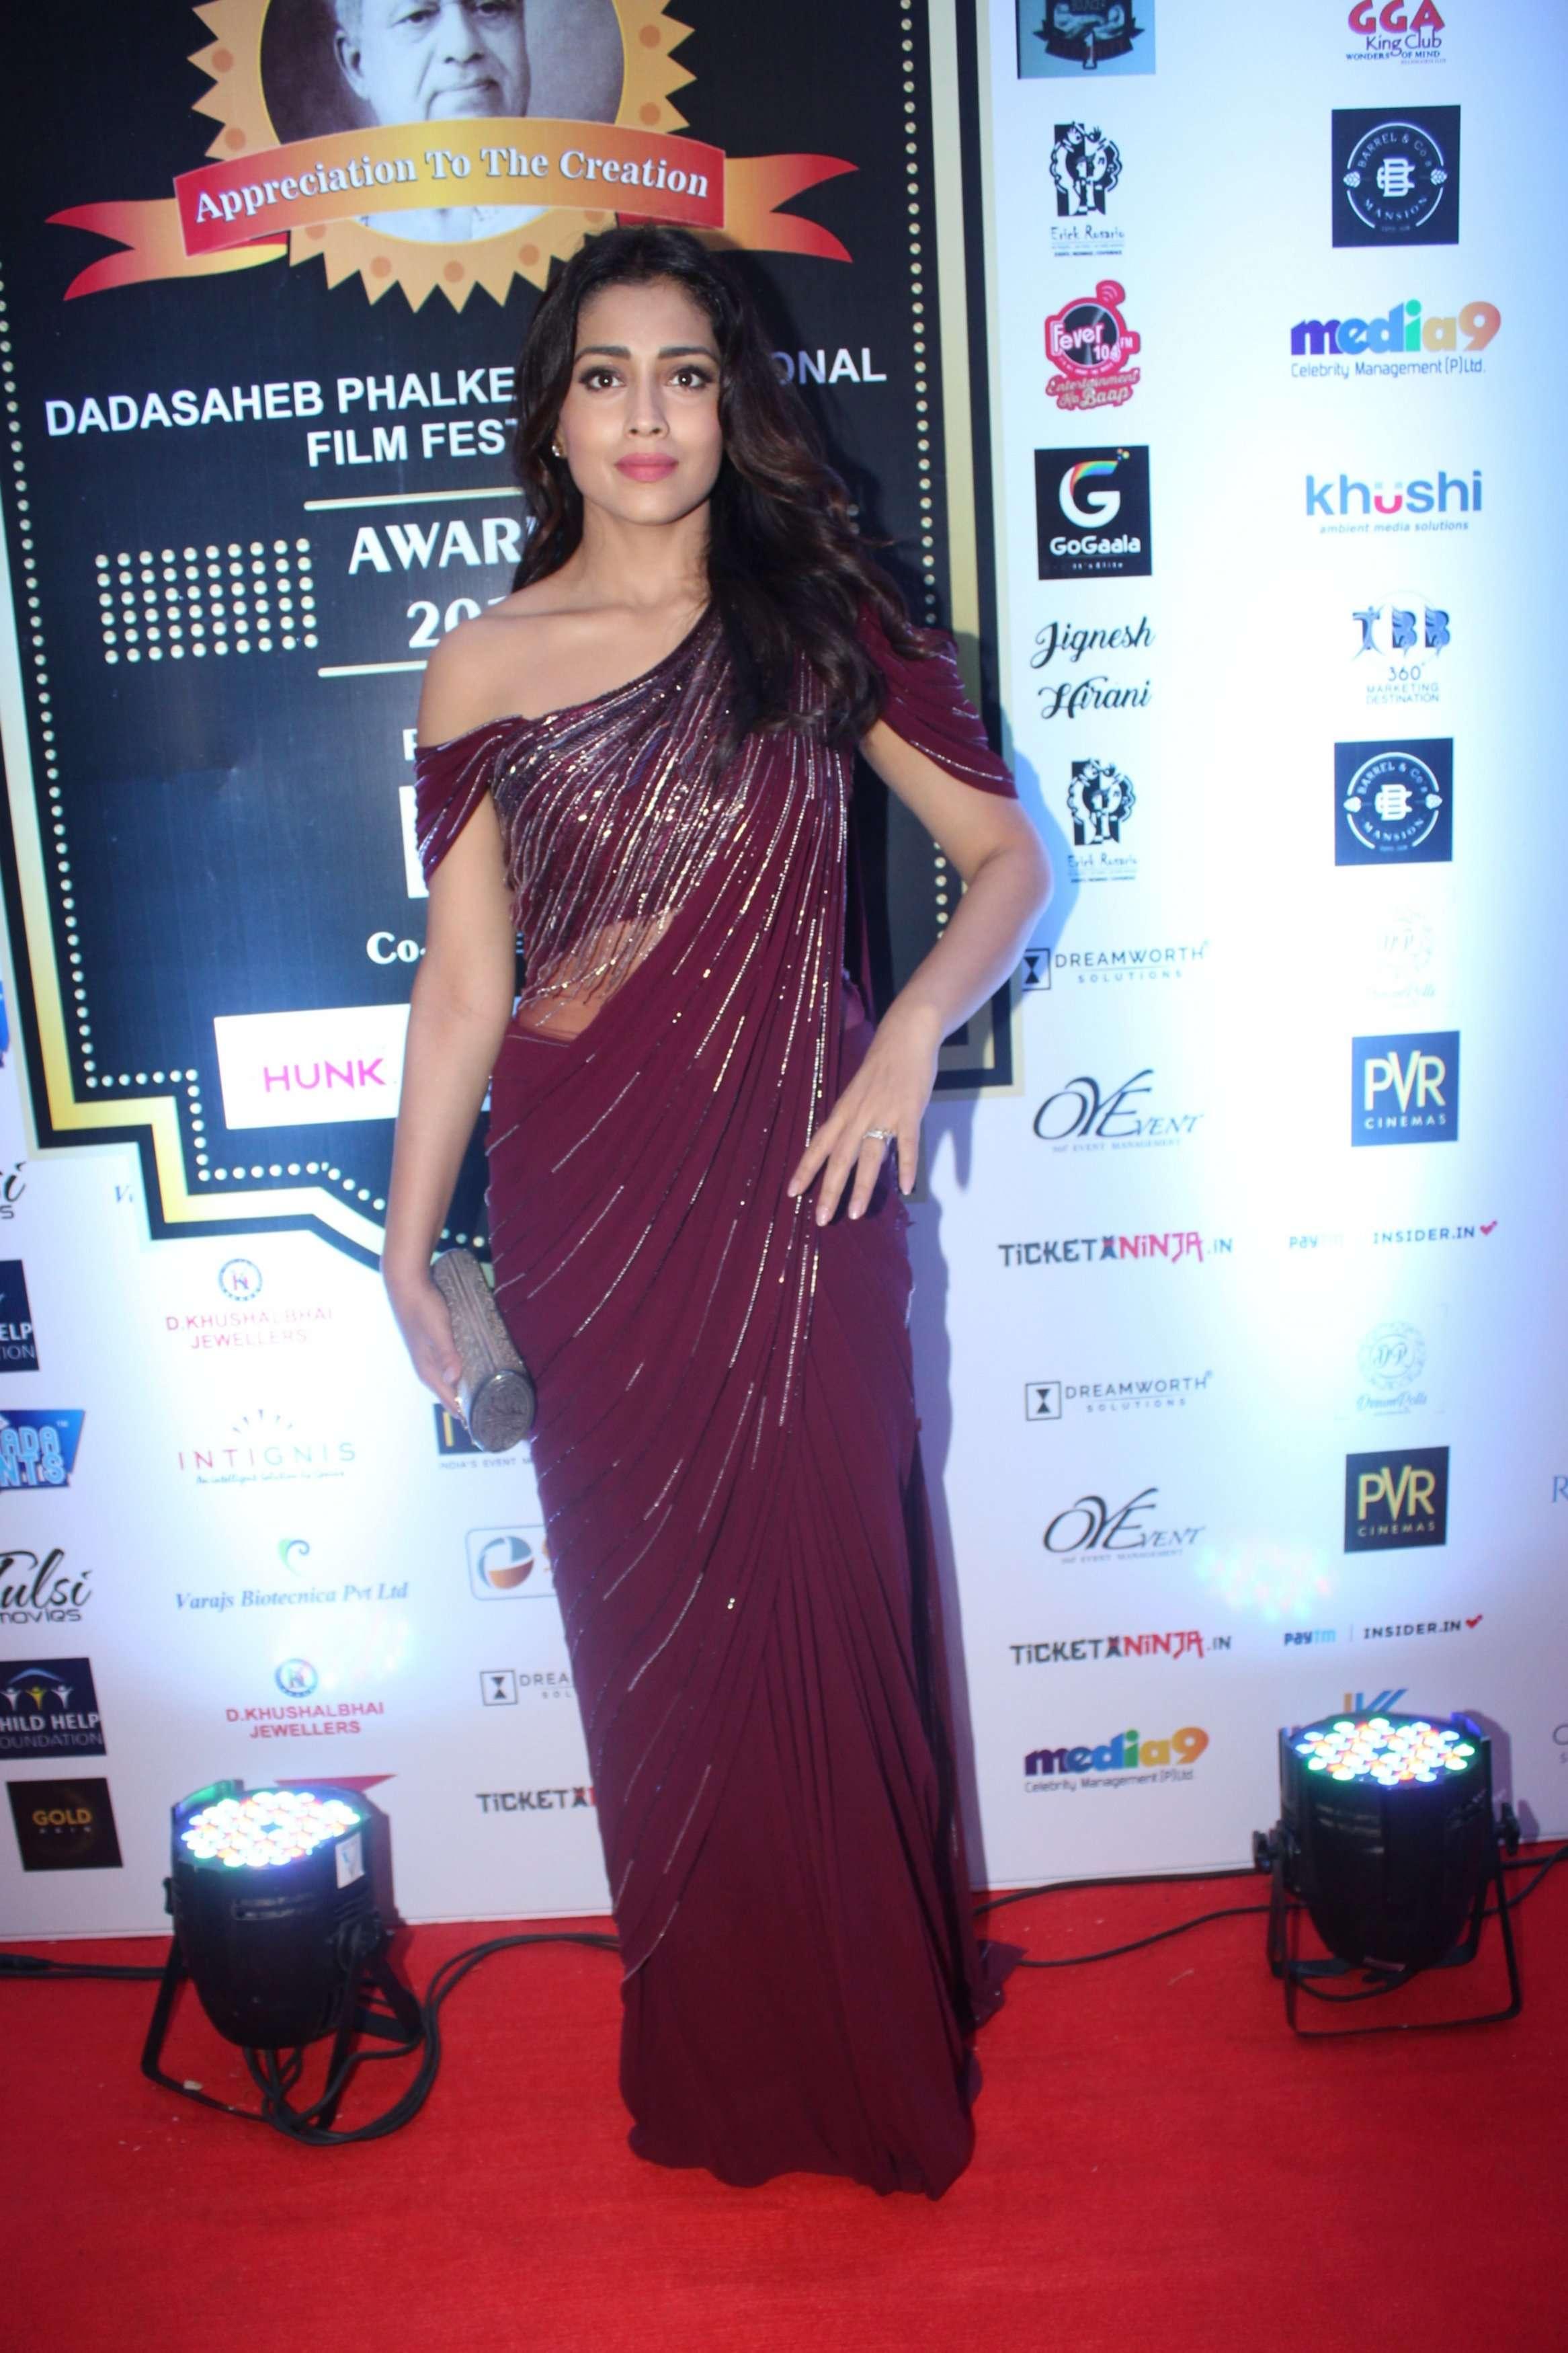 Dadasaheb Phalke International Film Festival Awards 2019 (1)